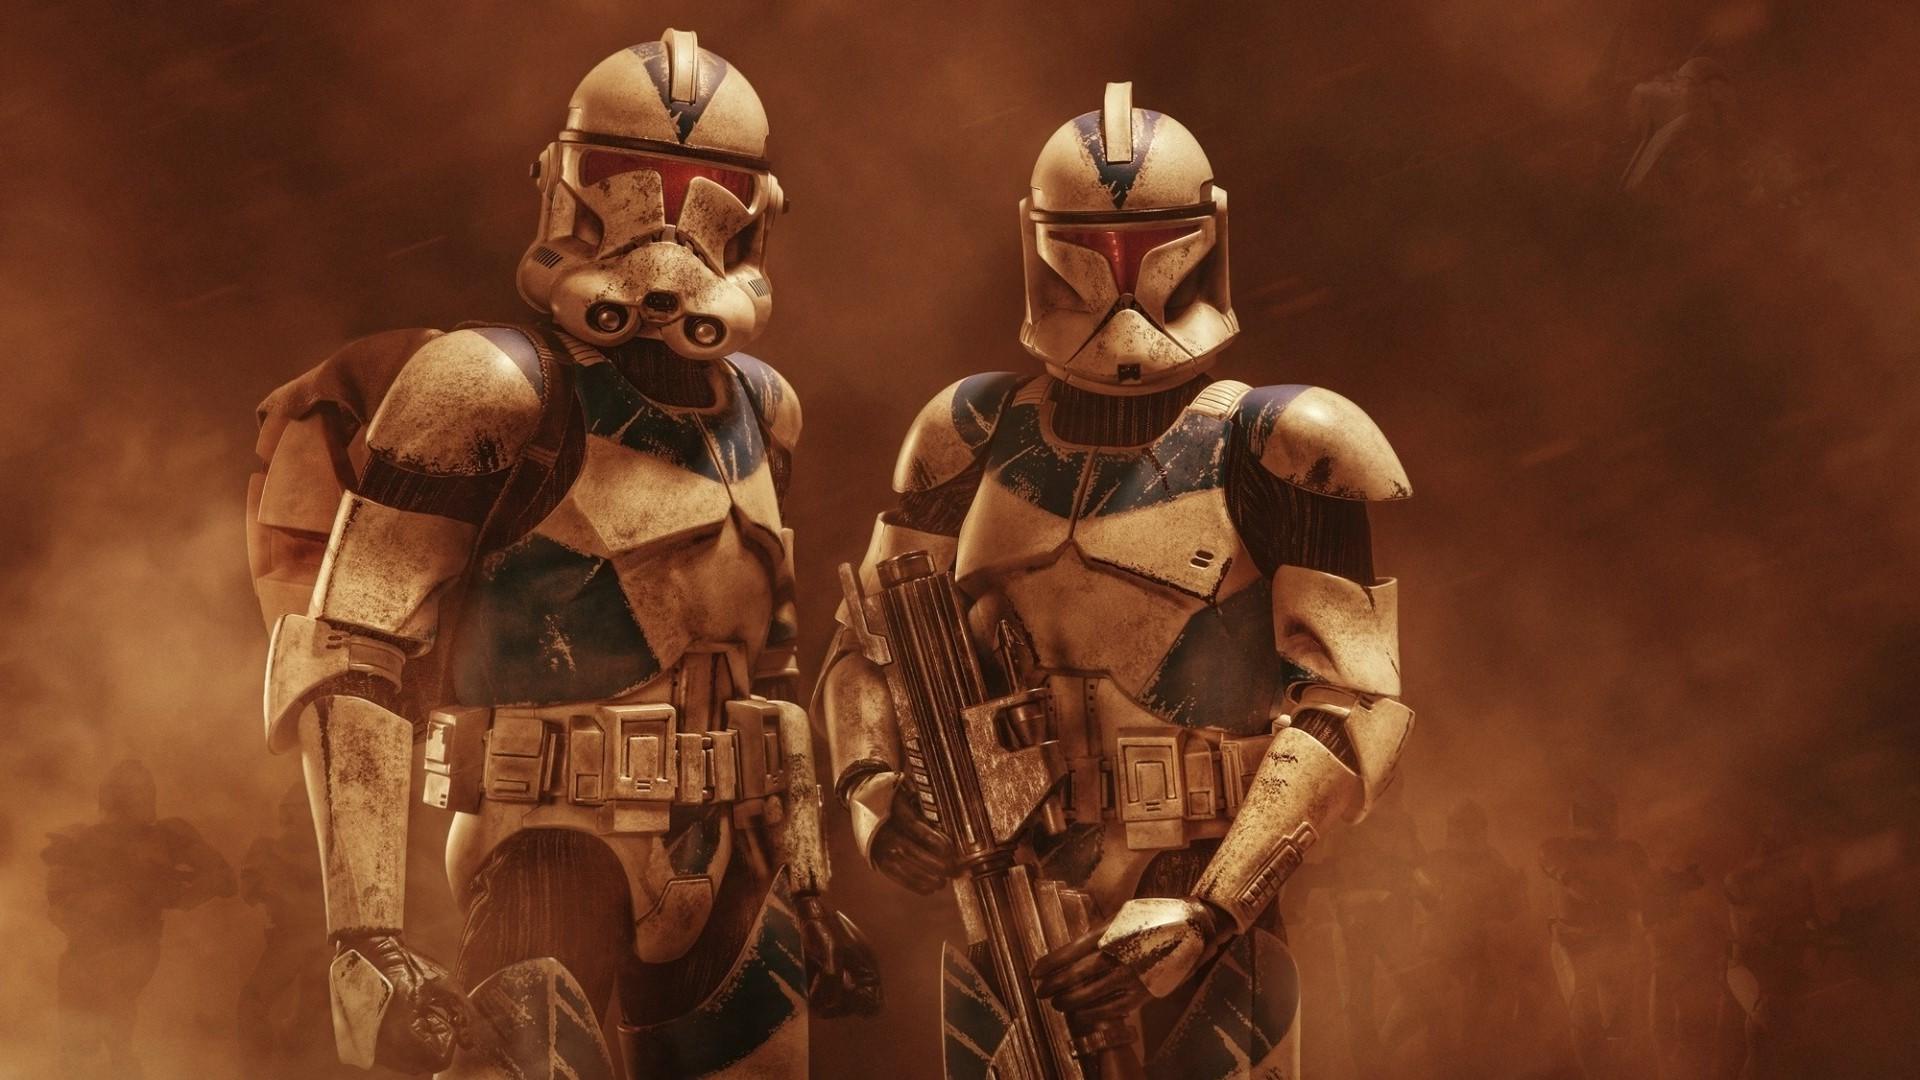 clone trooper wallpaper …